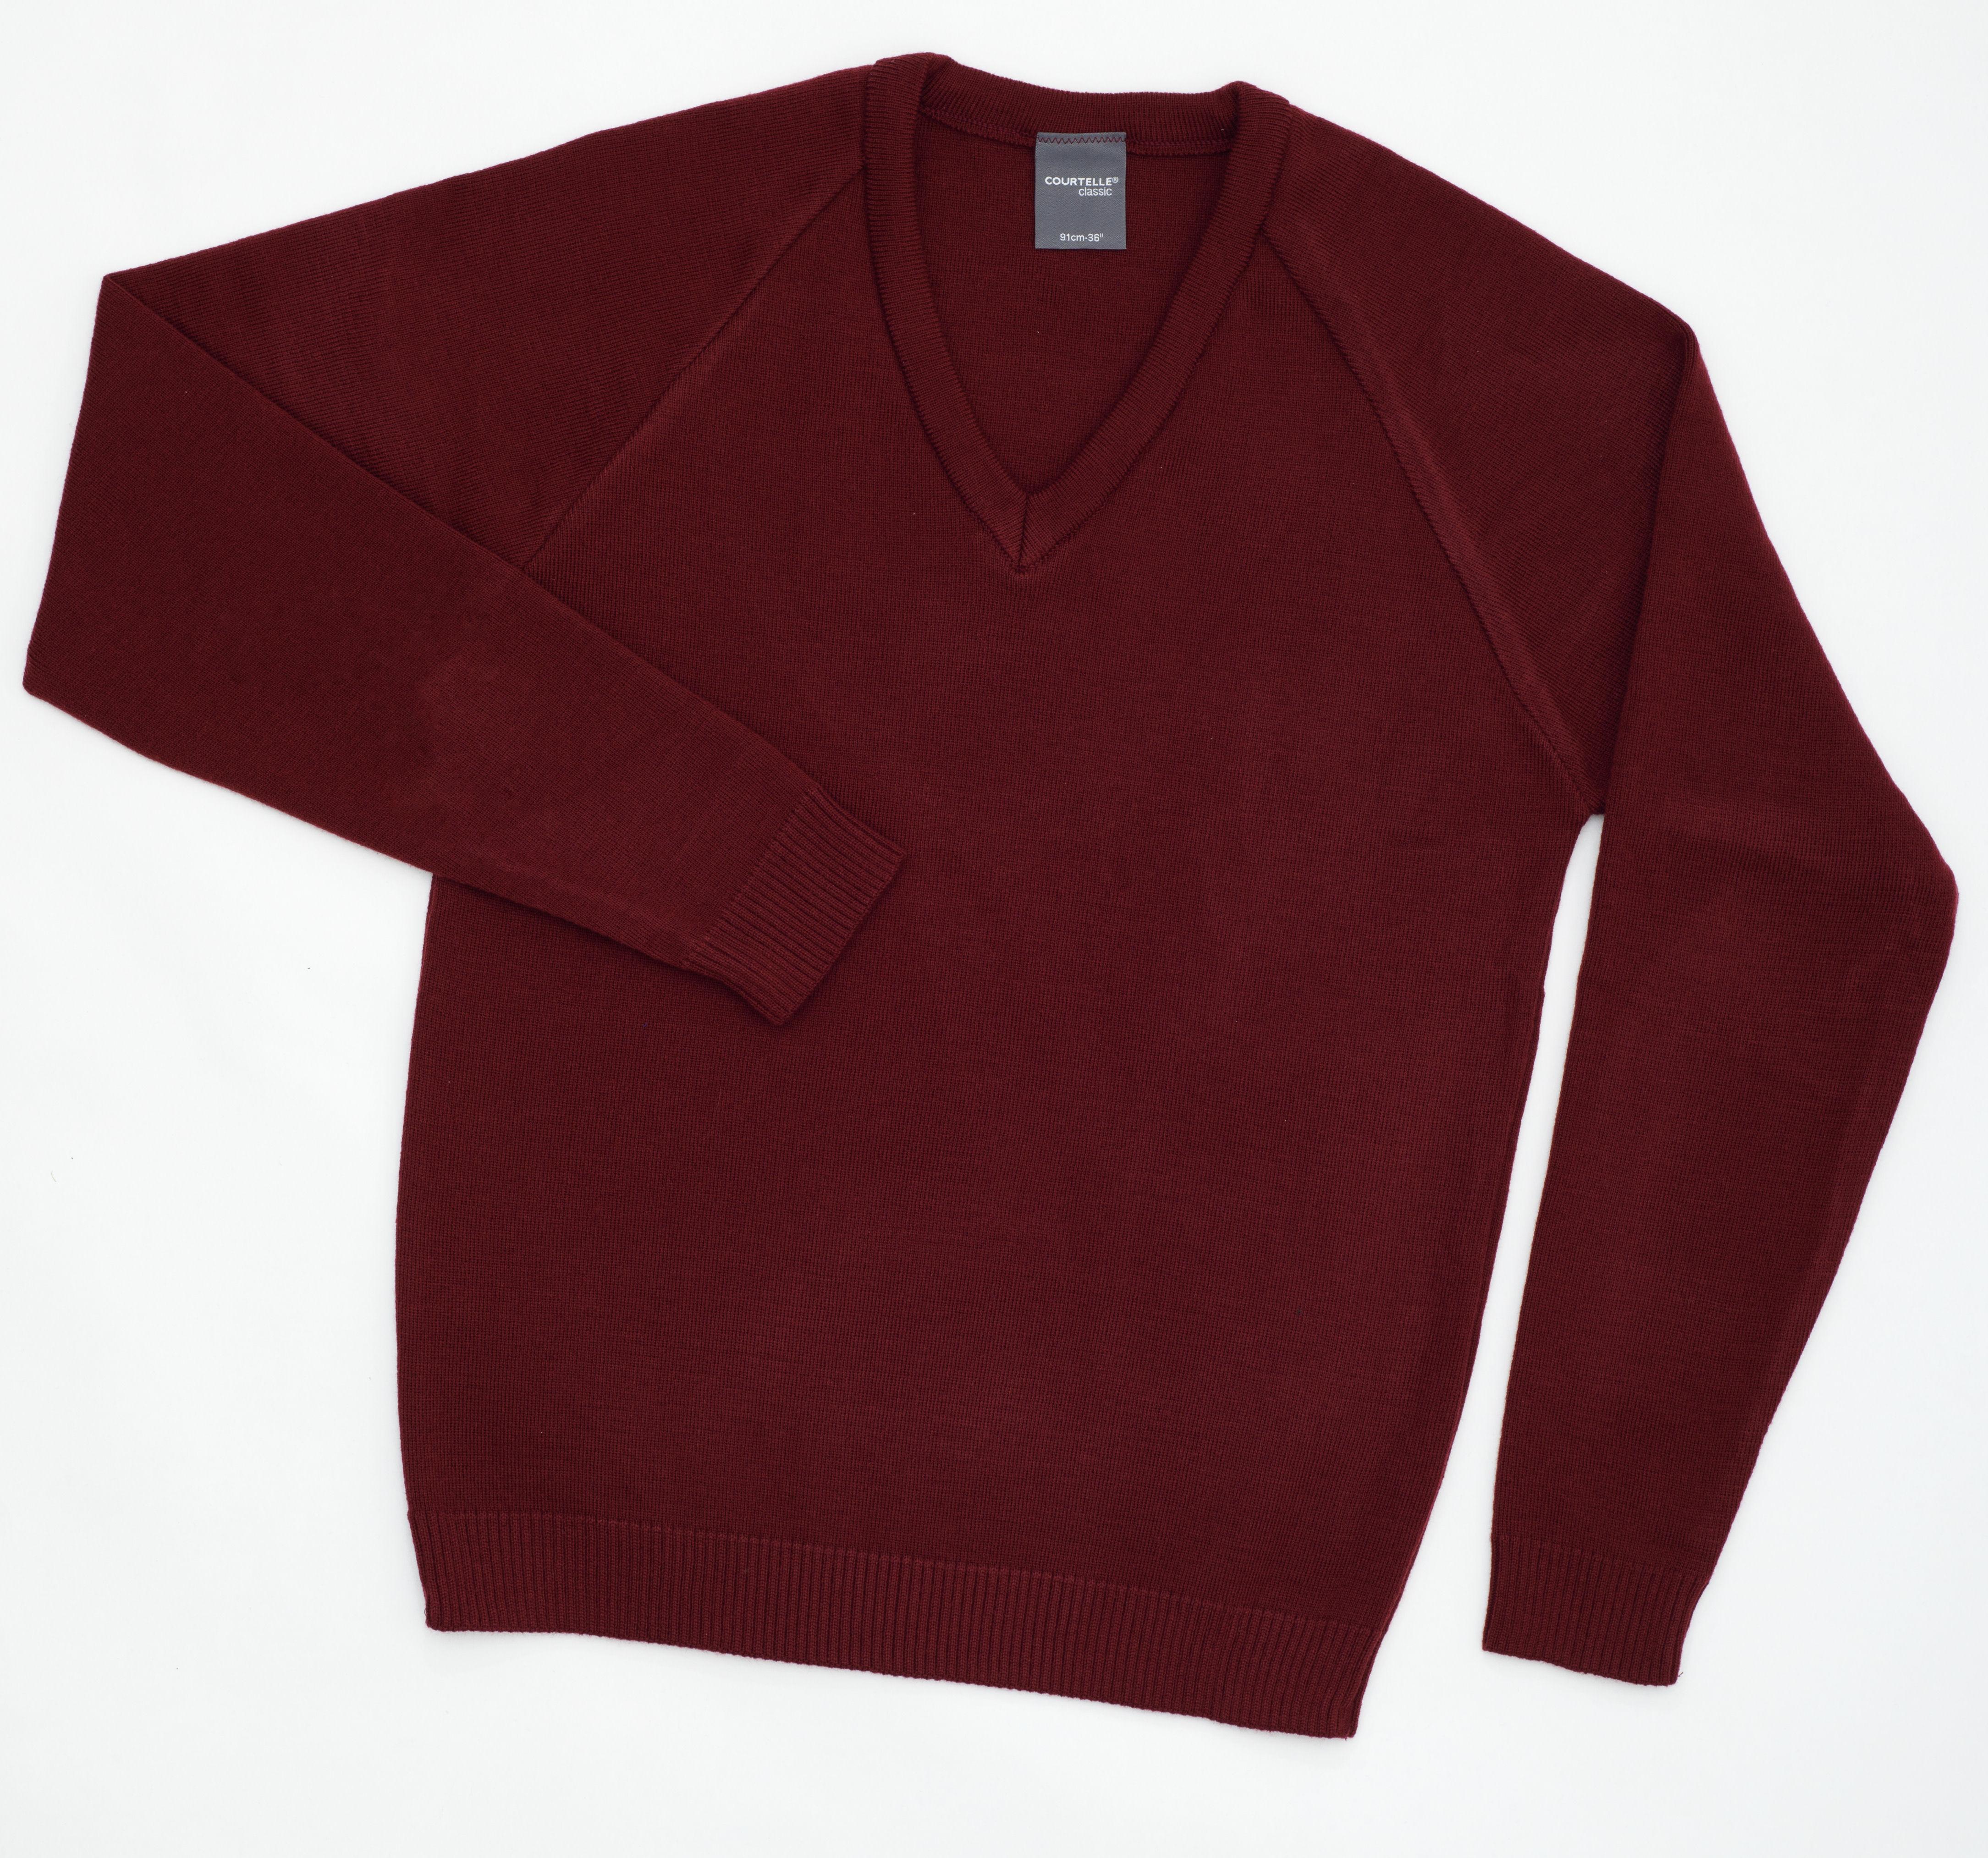 Courtelle Classic V-Neck Pullover MAROON/32